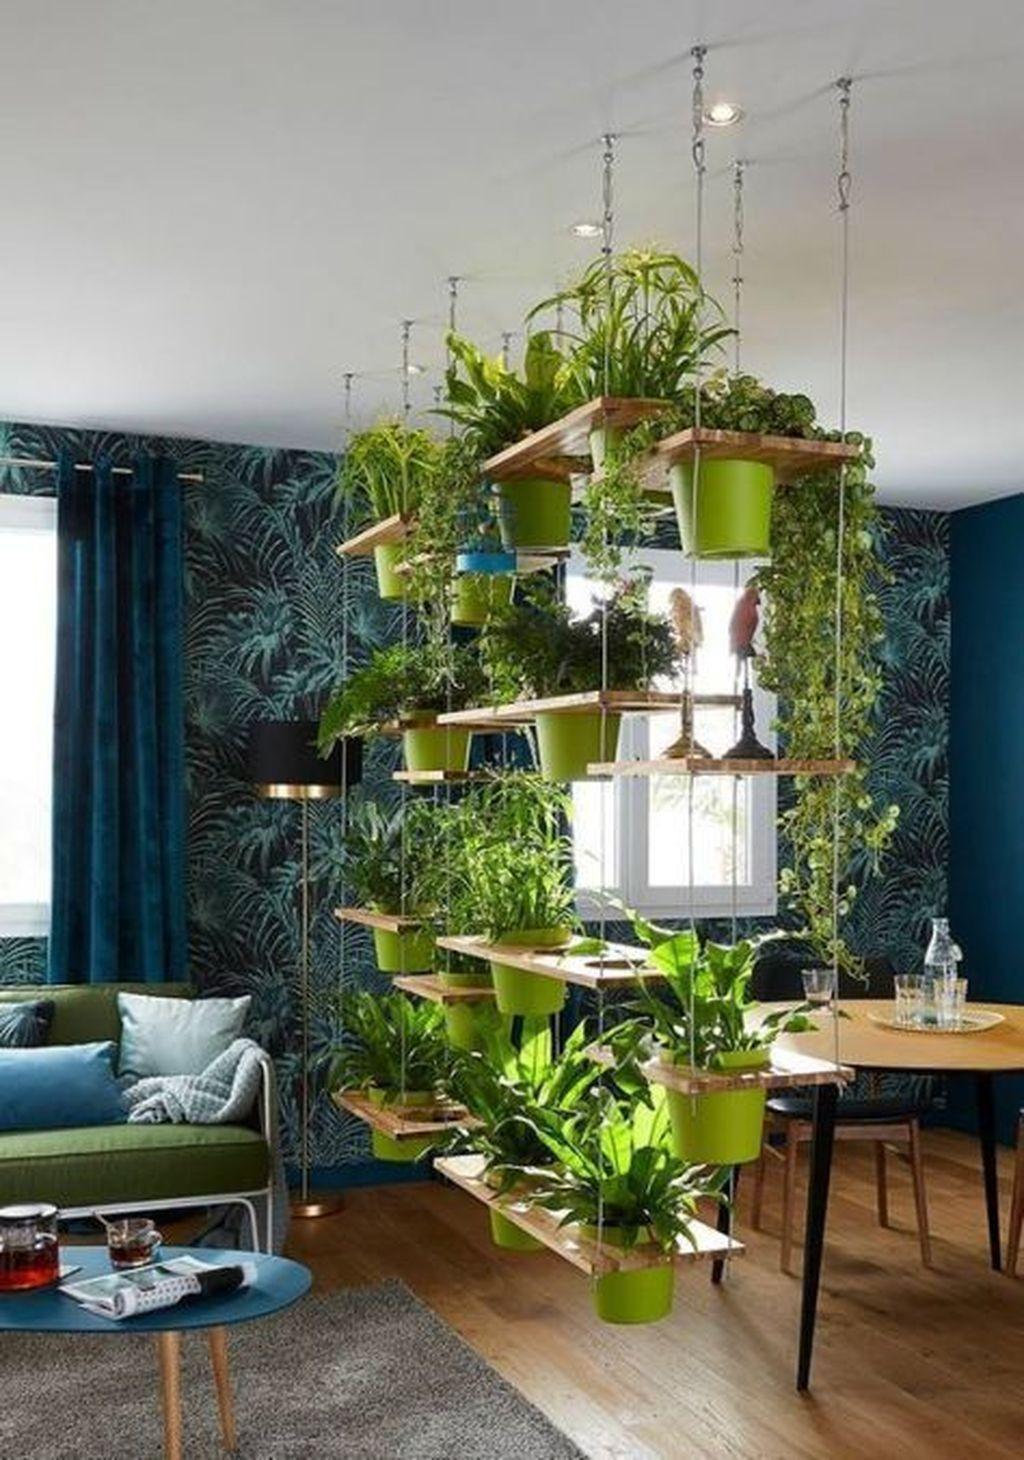 20 Gorgeous Indoor Garden Ideas For Beginner In Small Space In 2020 Plants Indoor Apartment Room With Plants Plant Decor Indoor